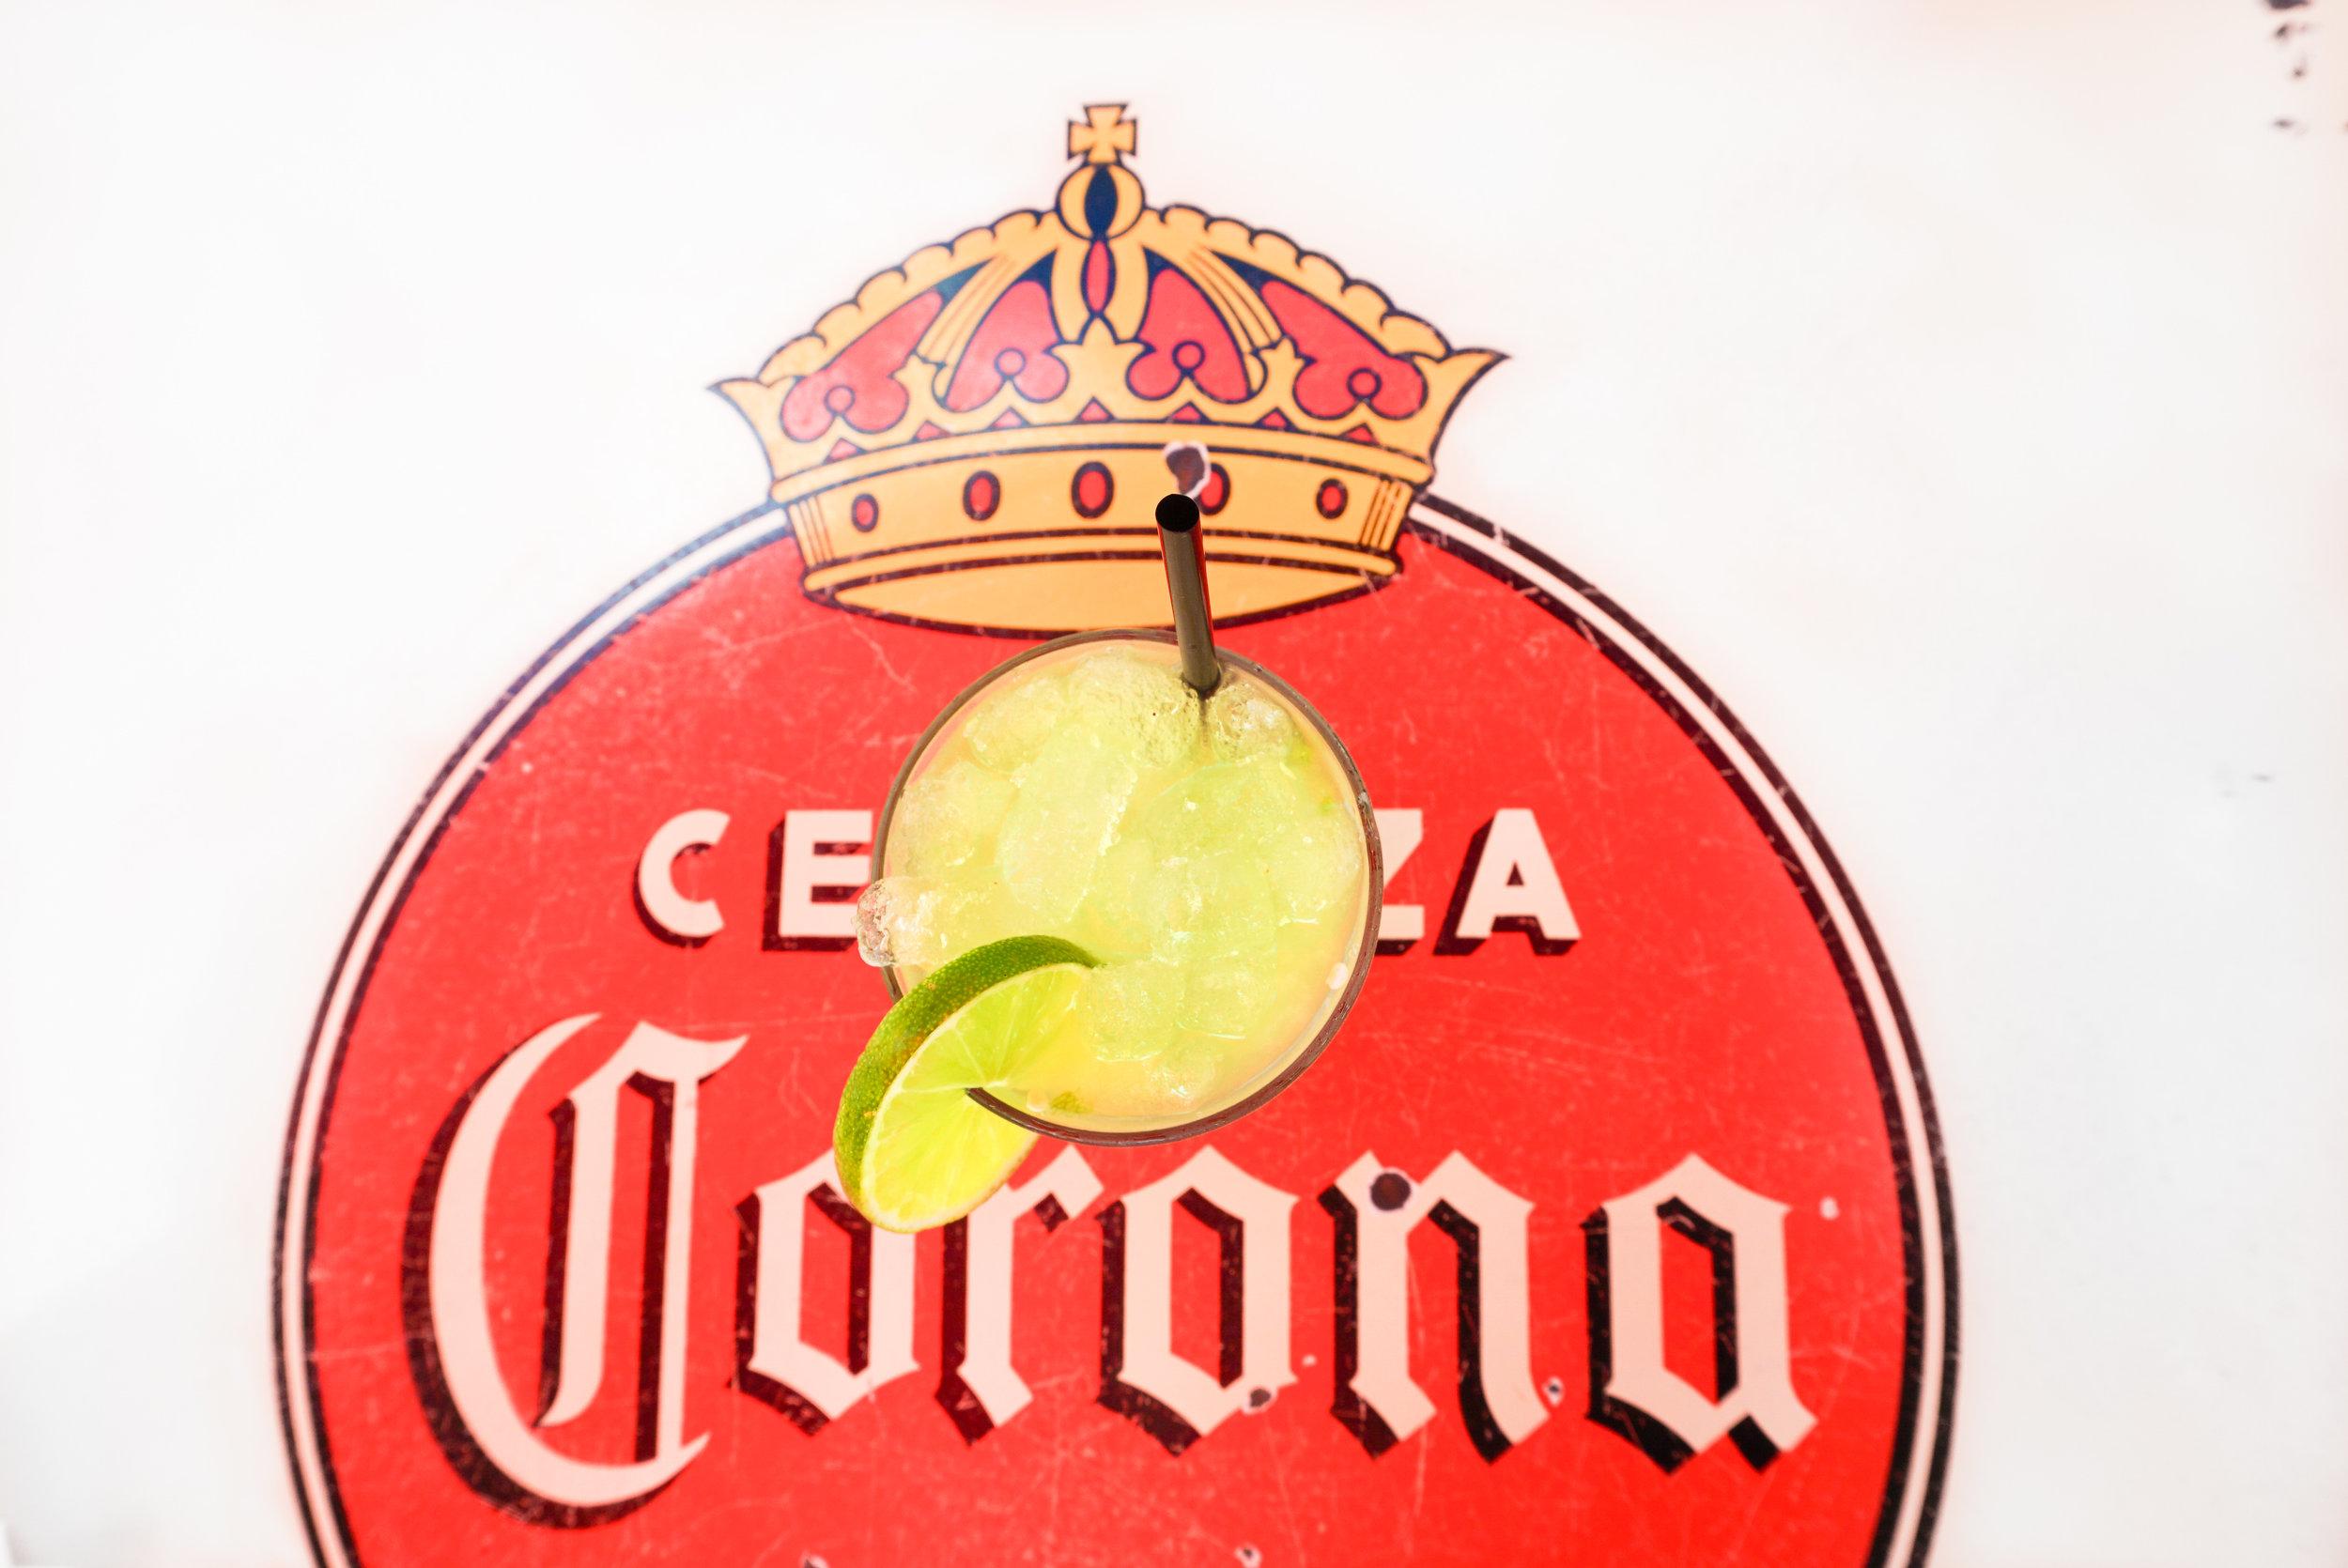 salsa limon margarita Fort Worth.jpg